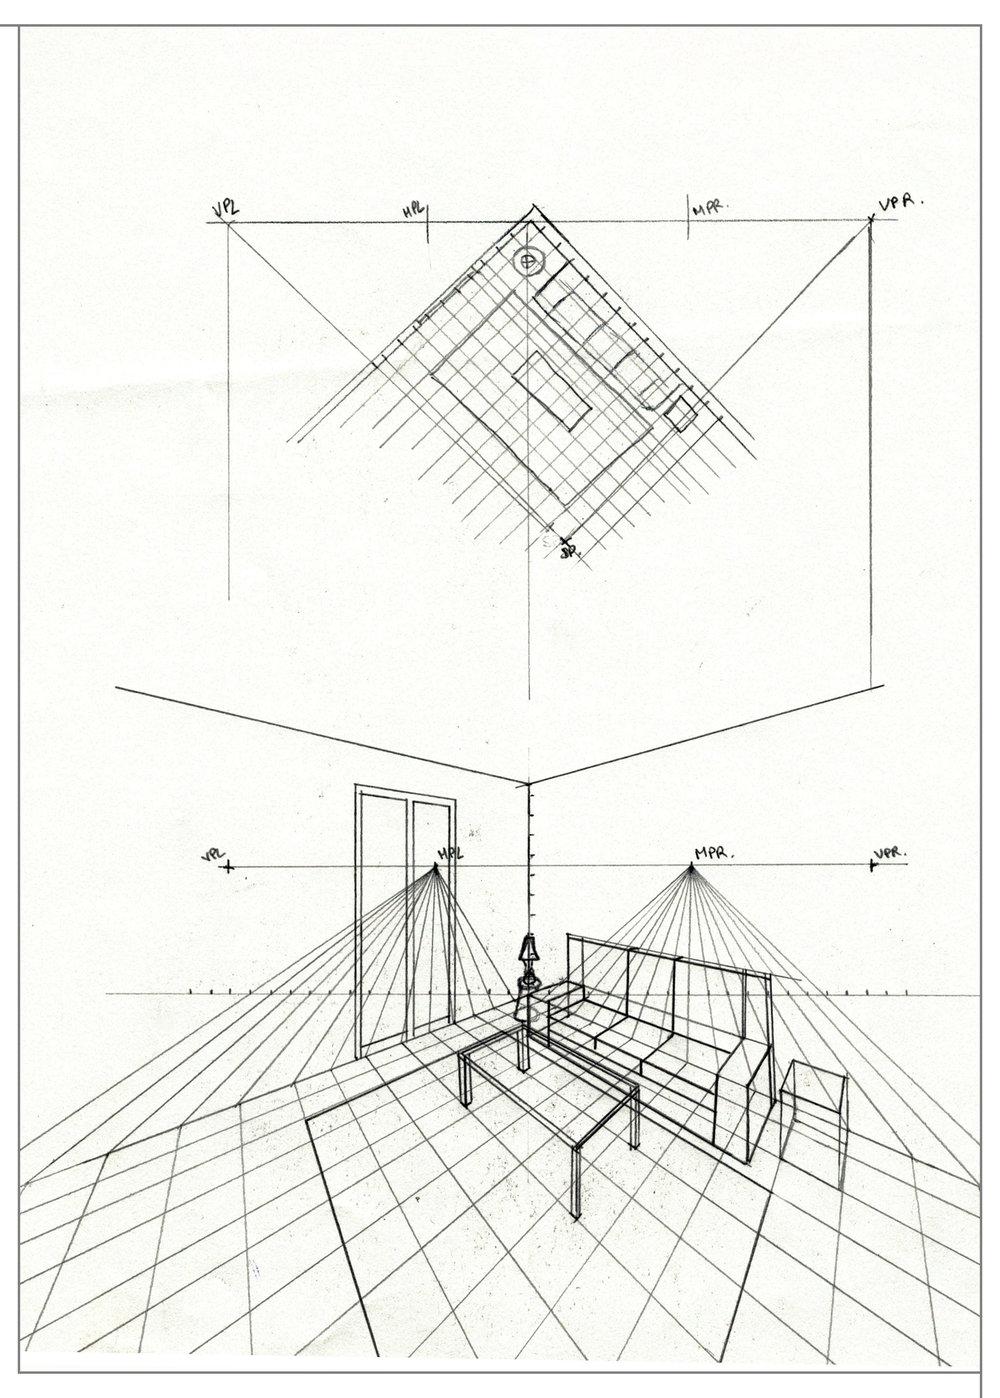 46-2pt-grid.ex.jpg